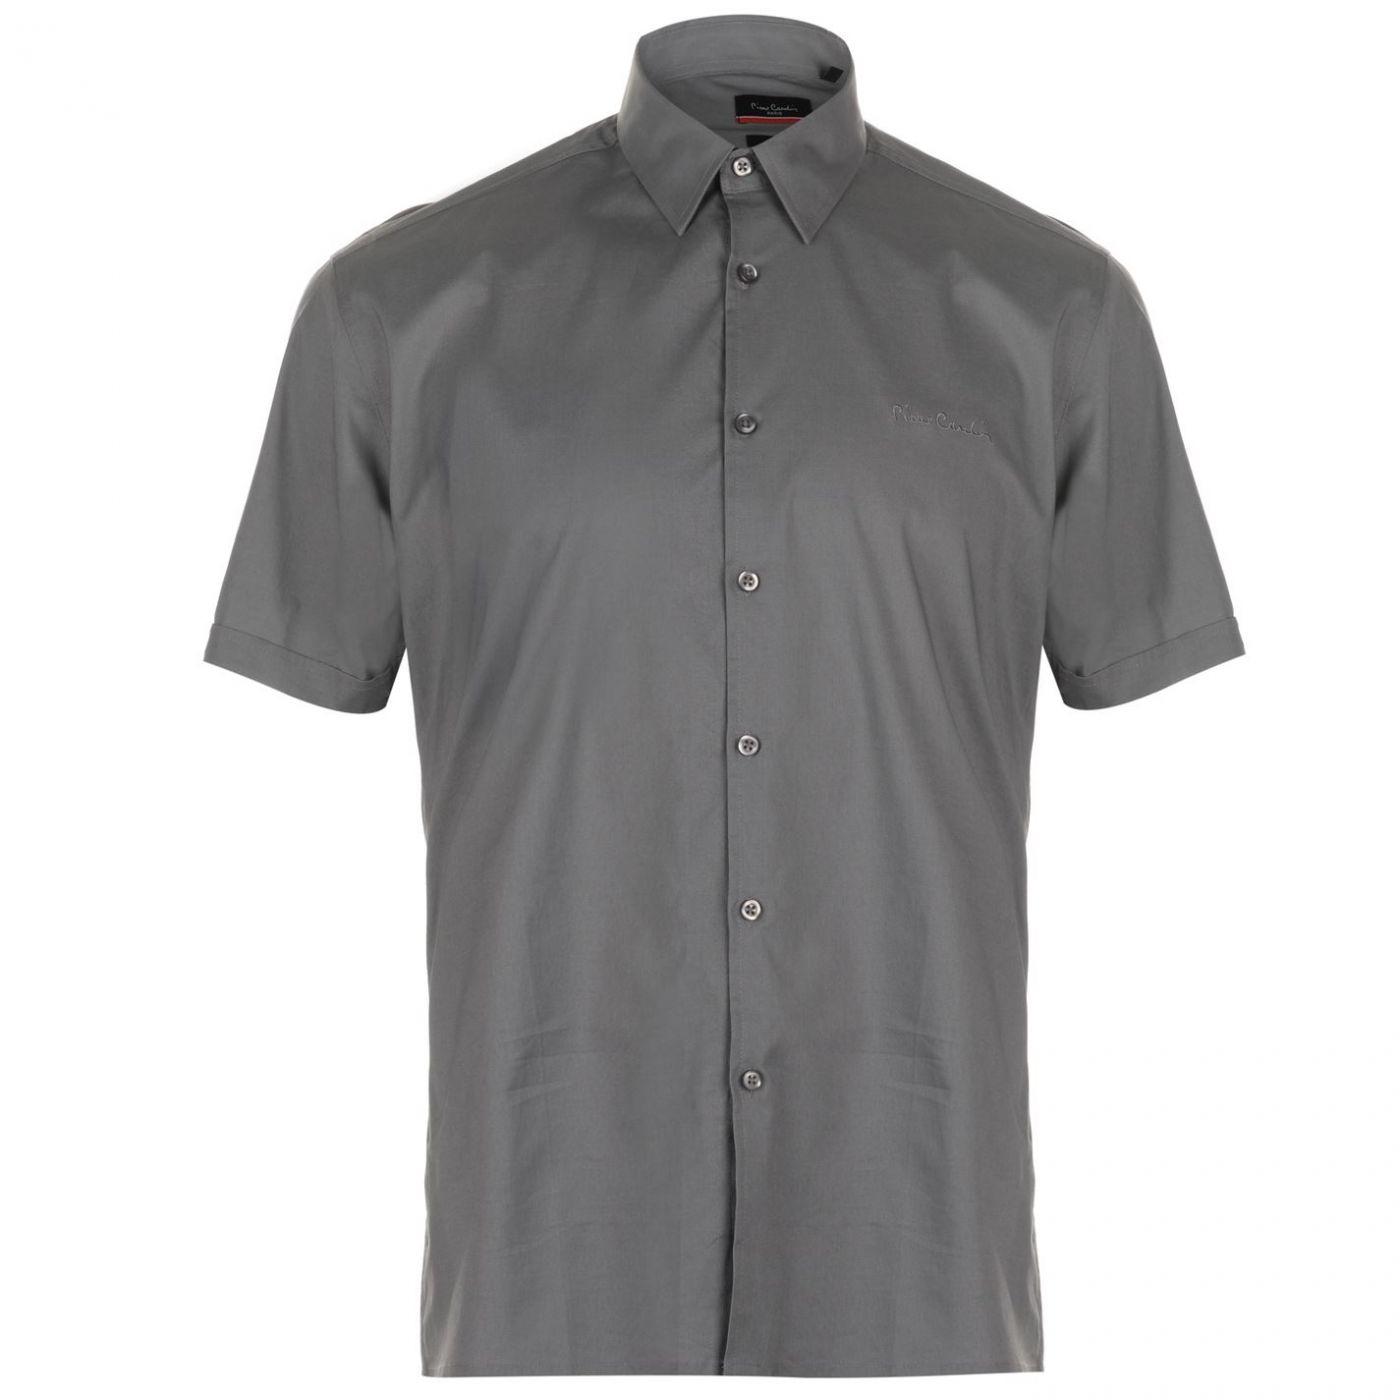 Pierre Cardin Slim Fit Short Sleeve Shirt Mens